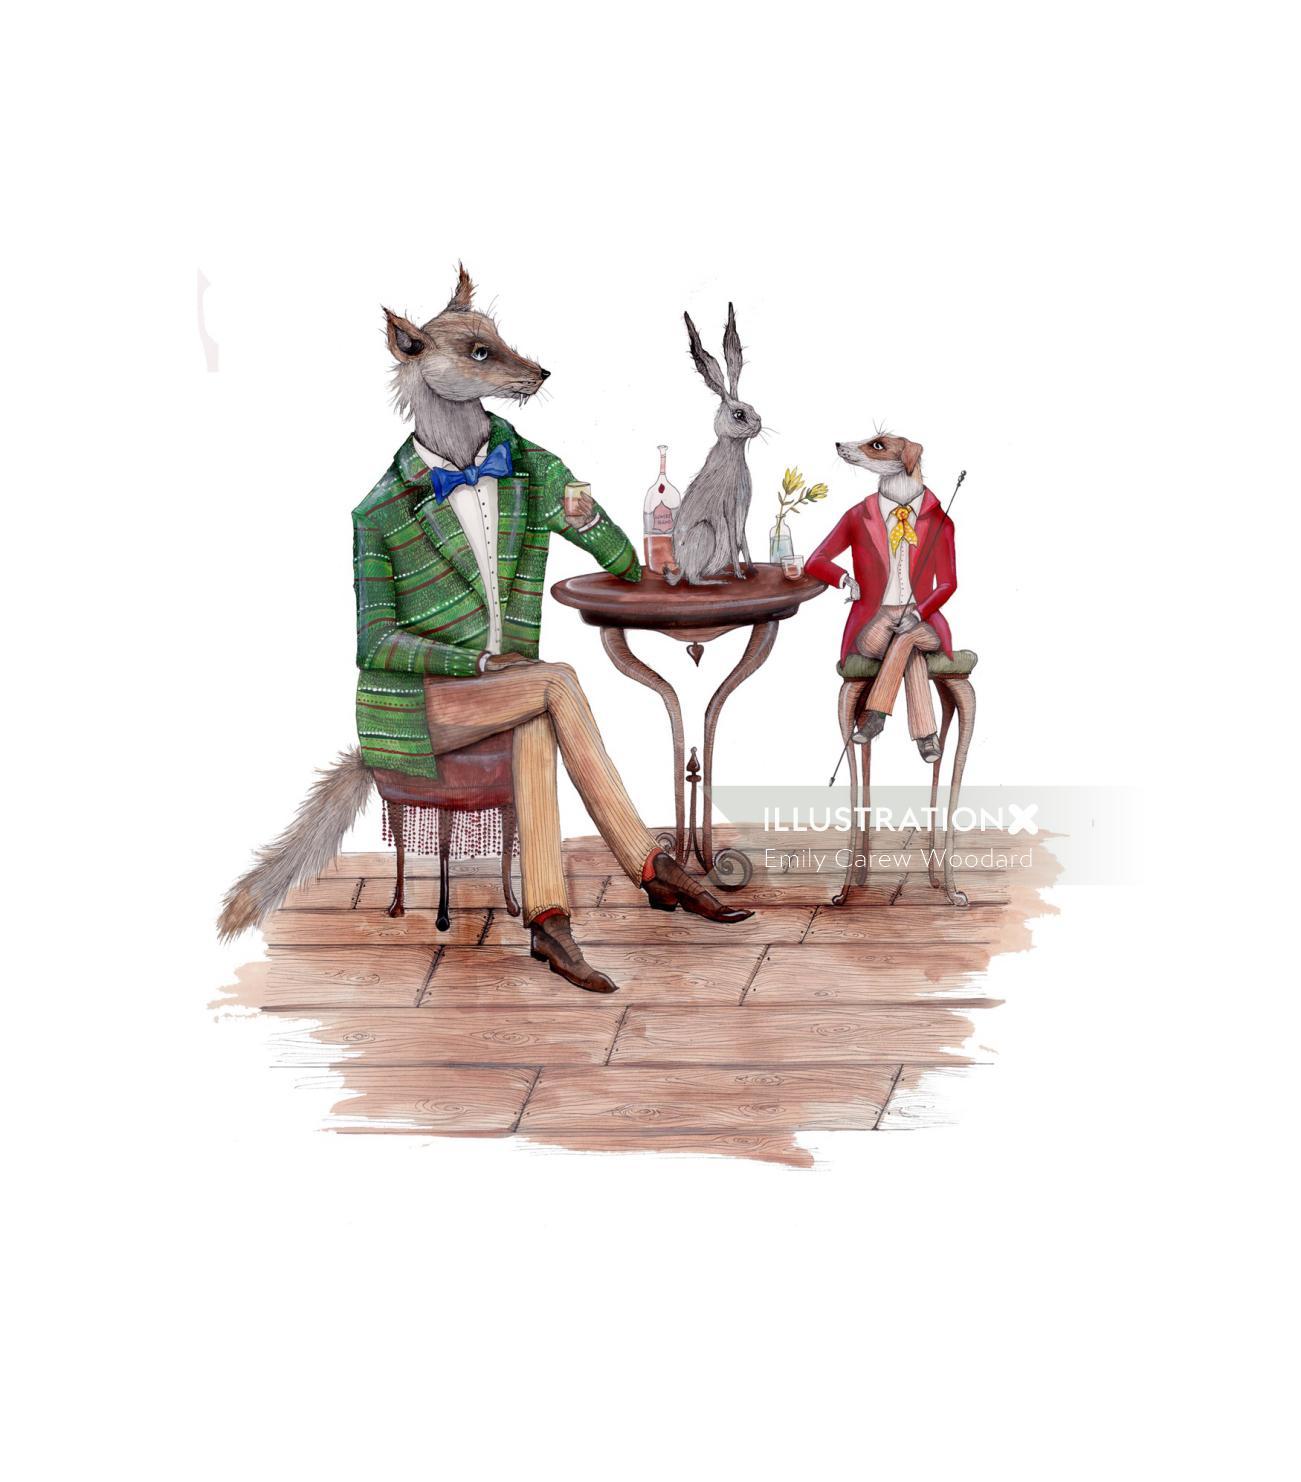 An illustration of fox, rabbit and dog in anthropomorphic scene